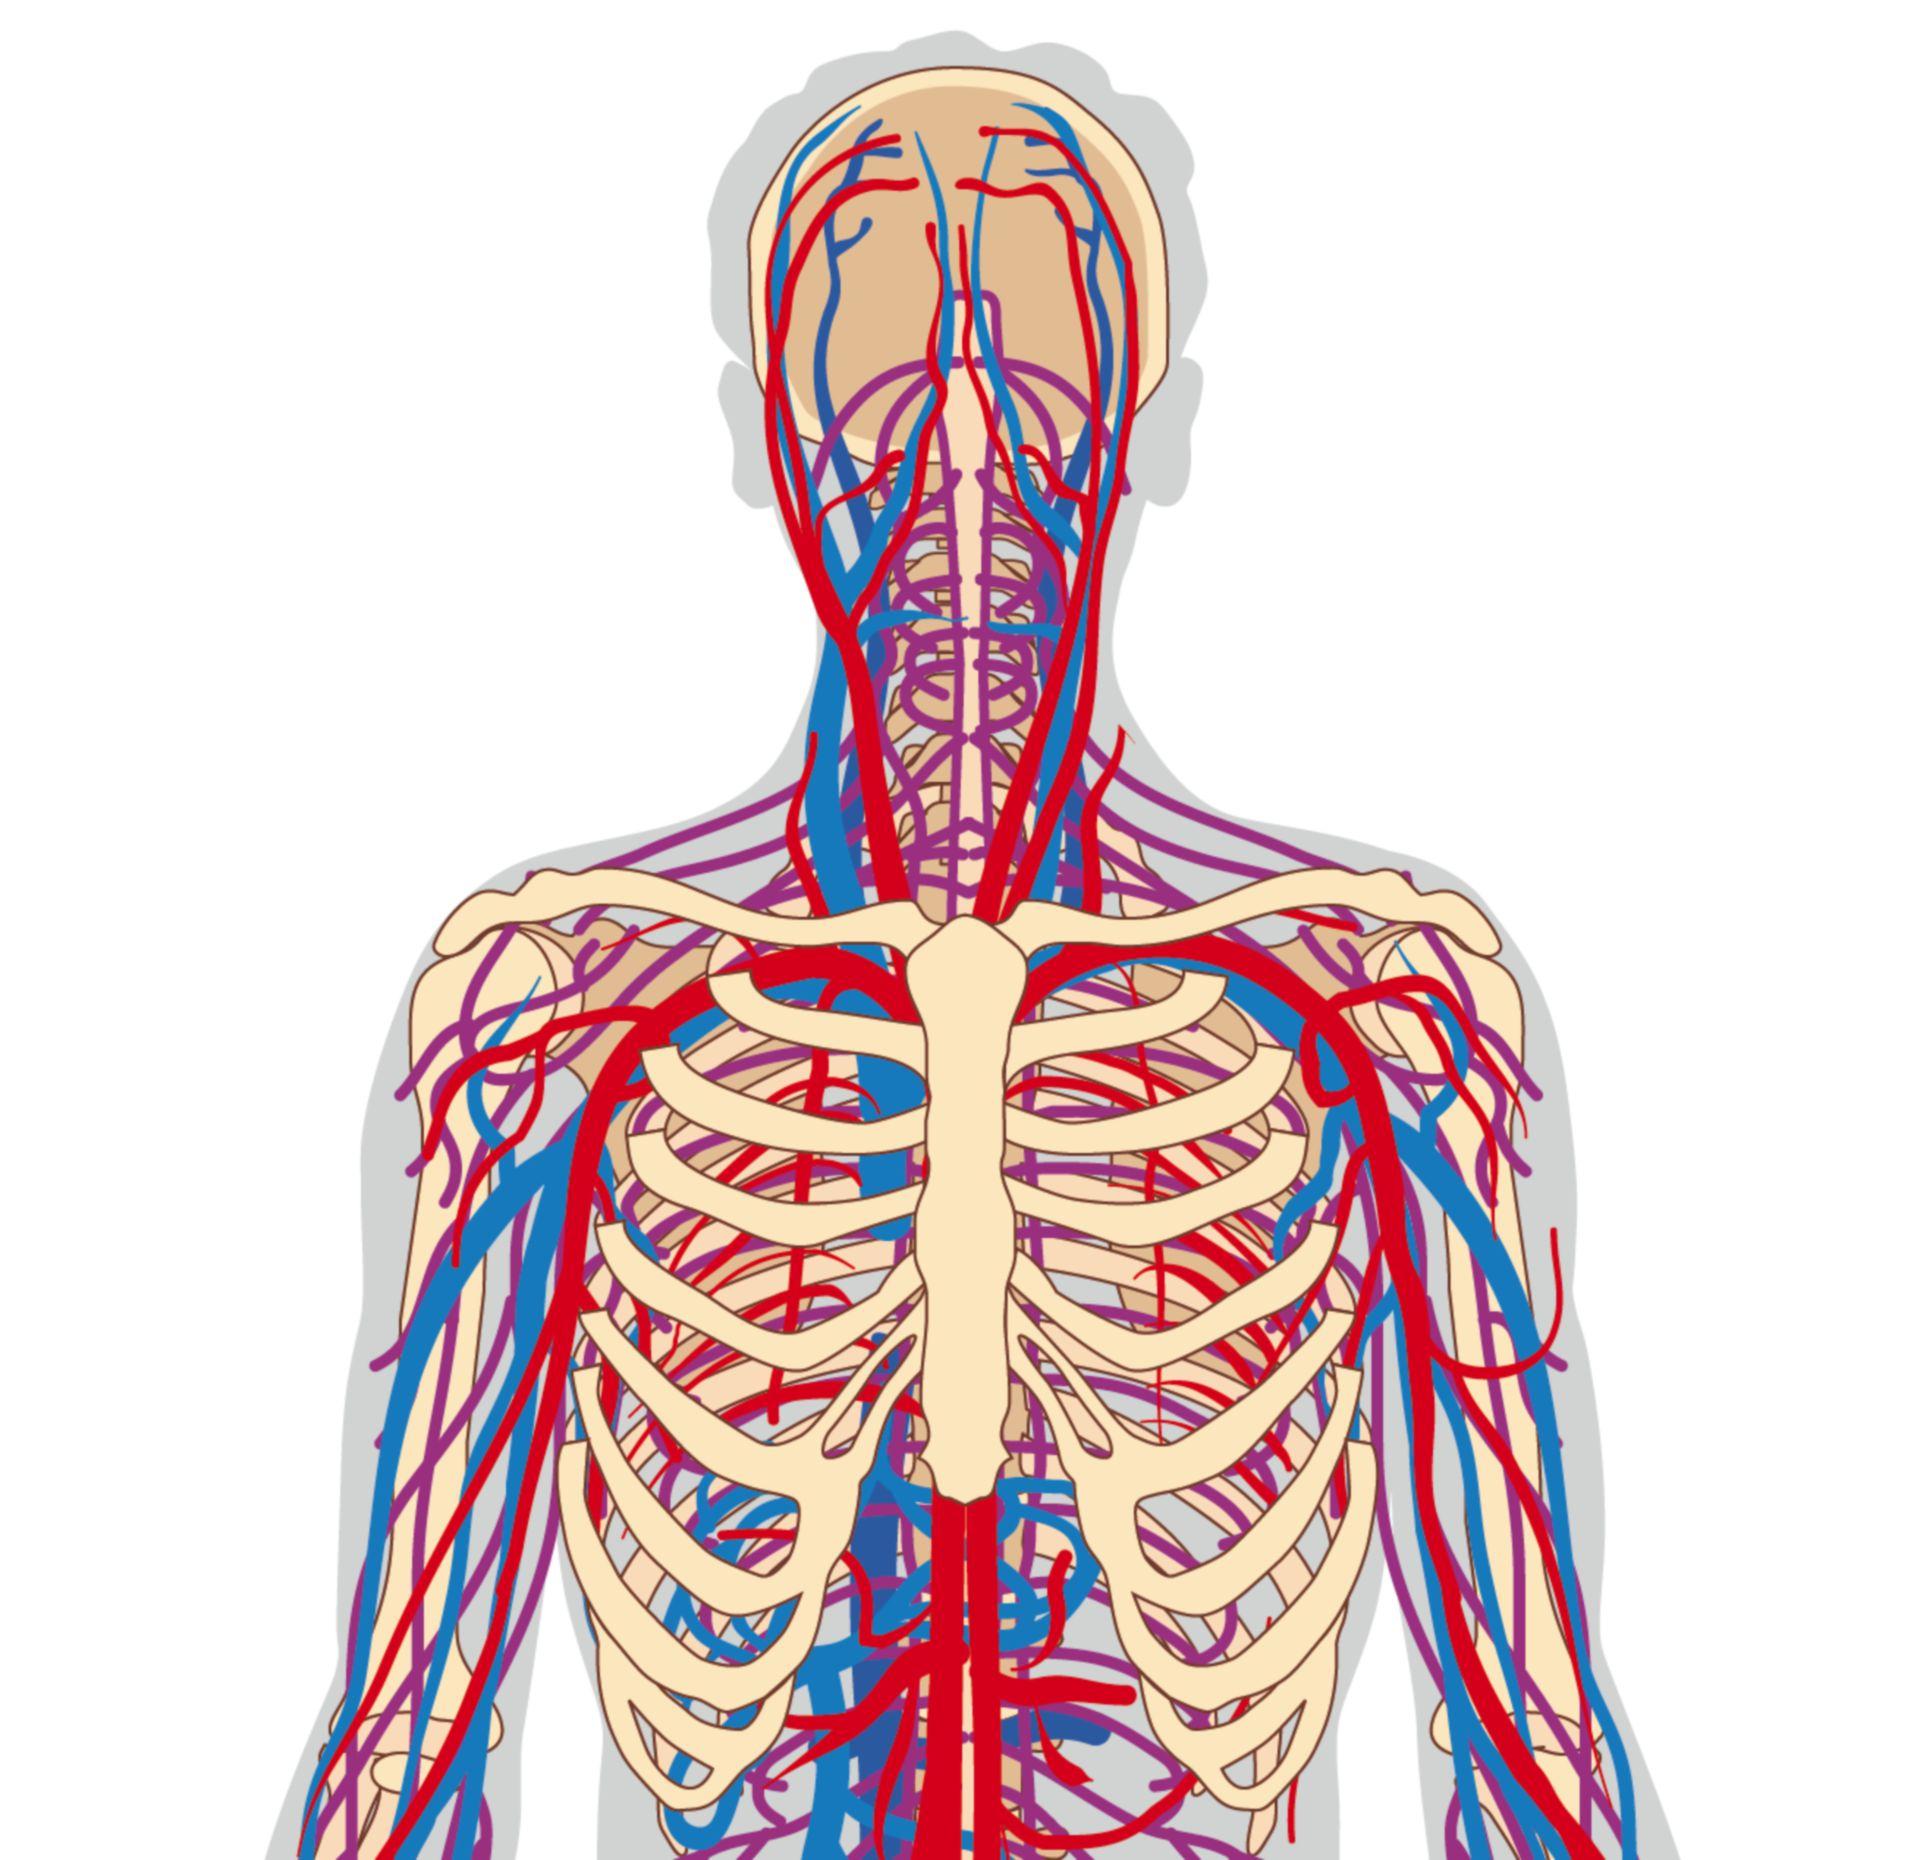 Blood supplying vessels